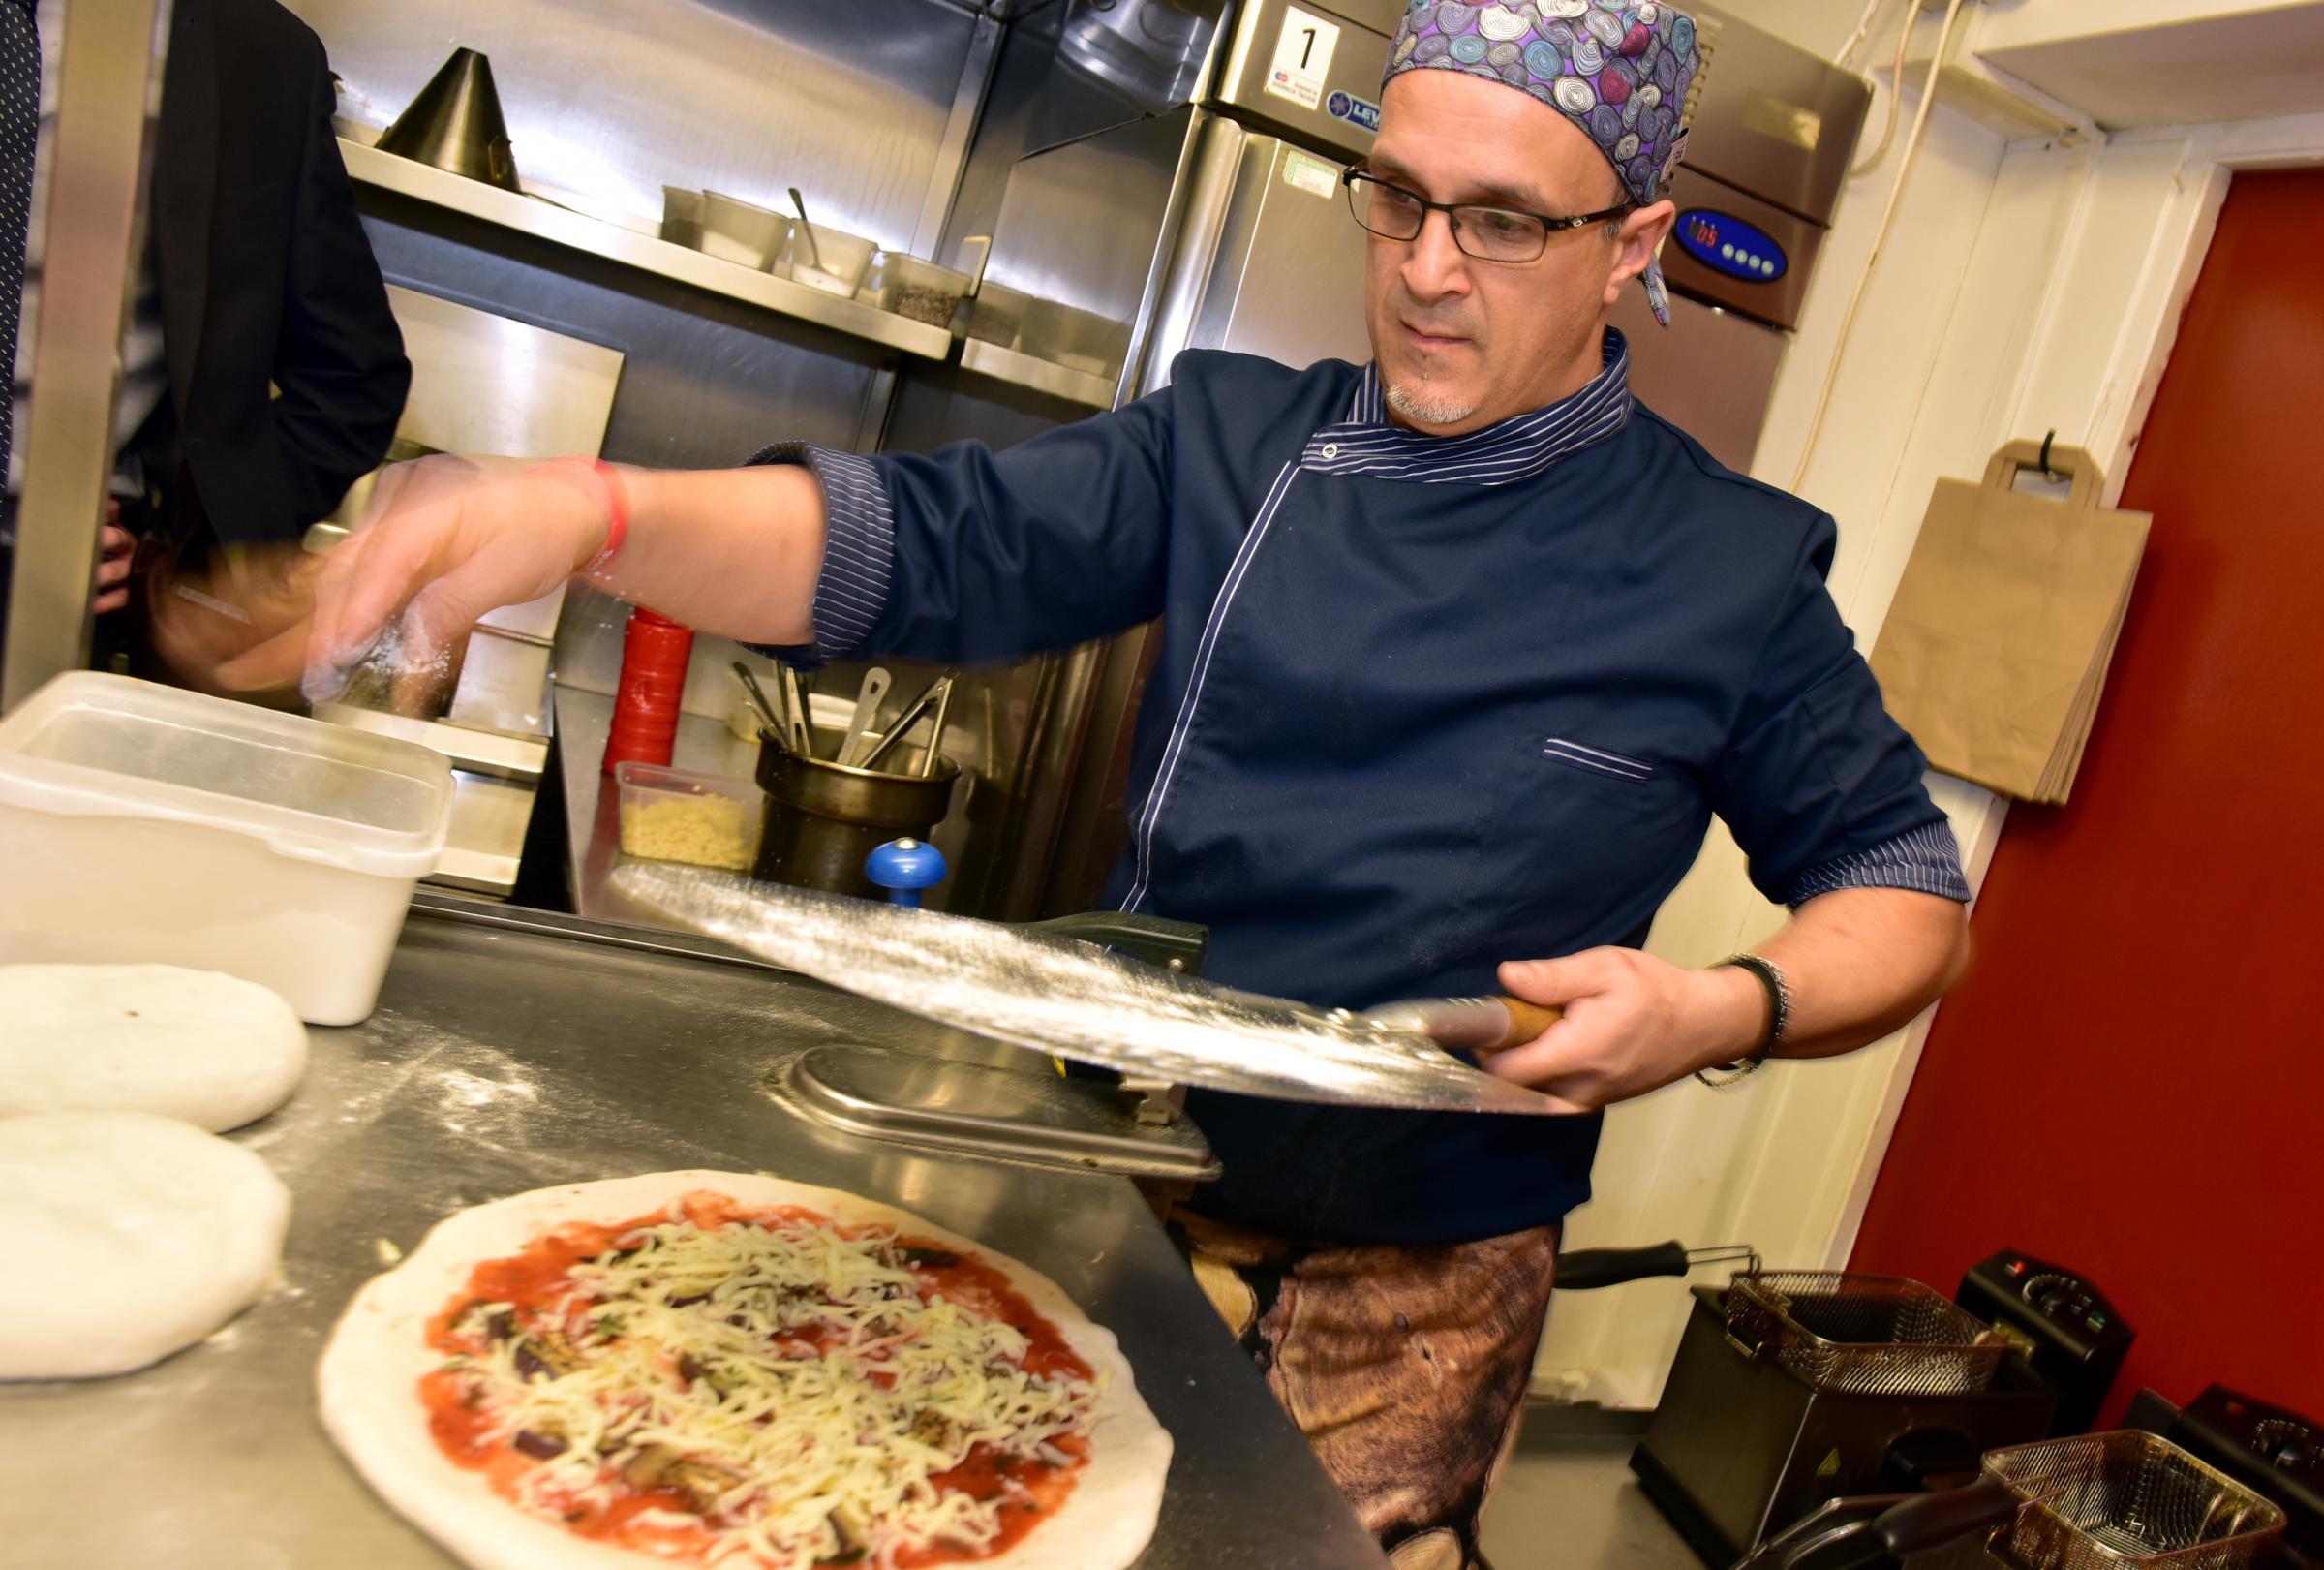 Mondellos Named Best Pizza Restaurant With Best Chef In